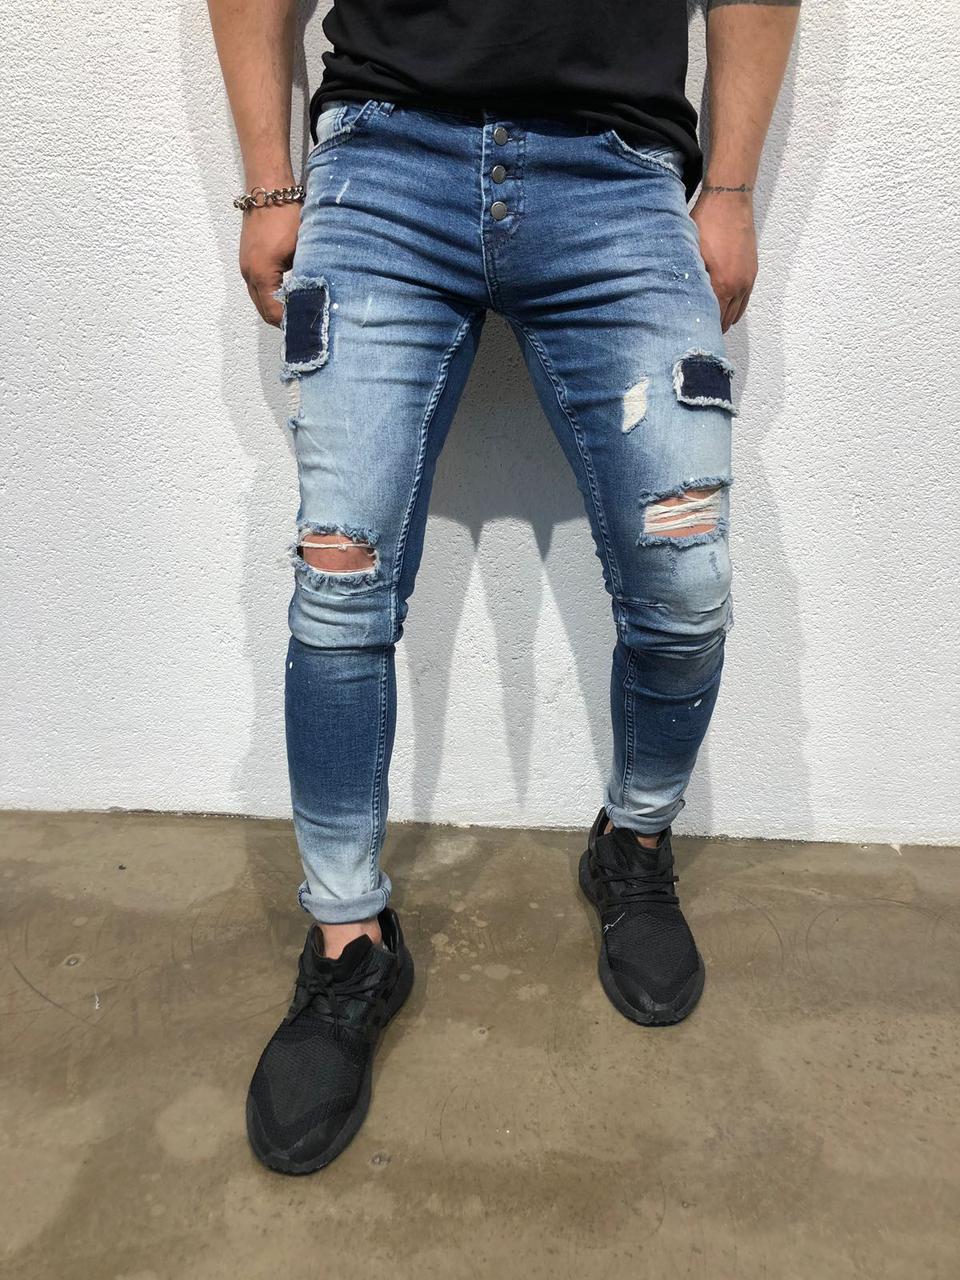 59956d6e0b8 Мужские джинсы рваные Hard-Rock Black Island 1874b синие